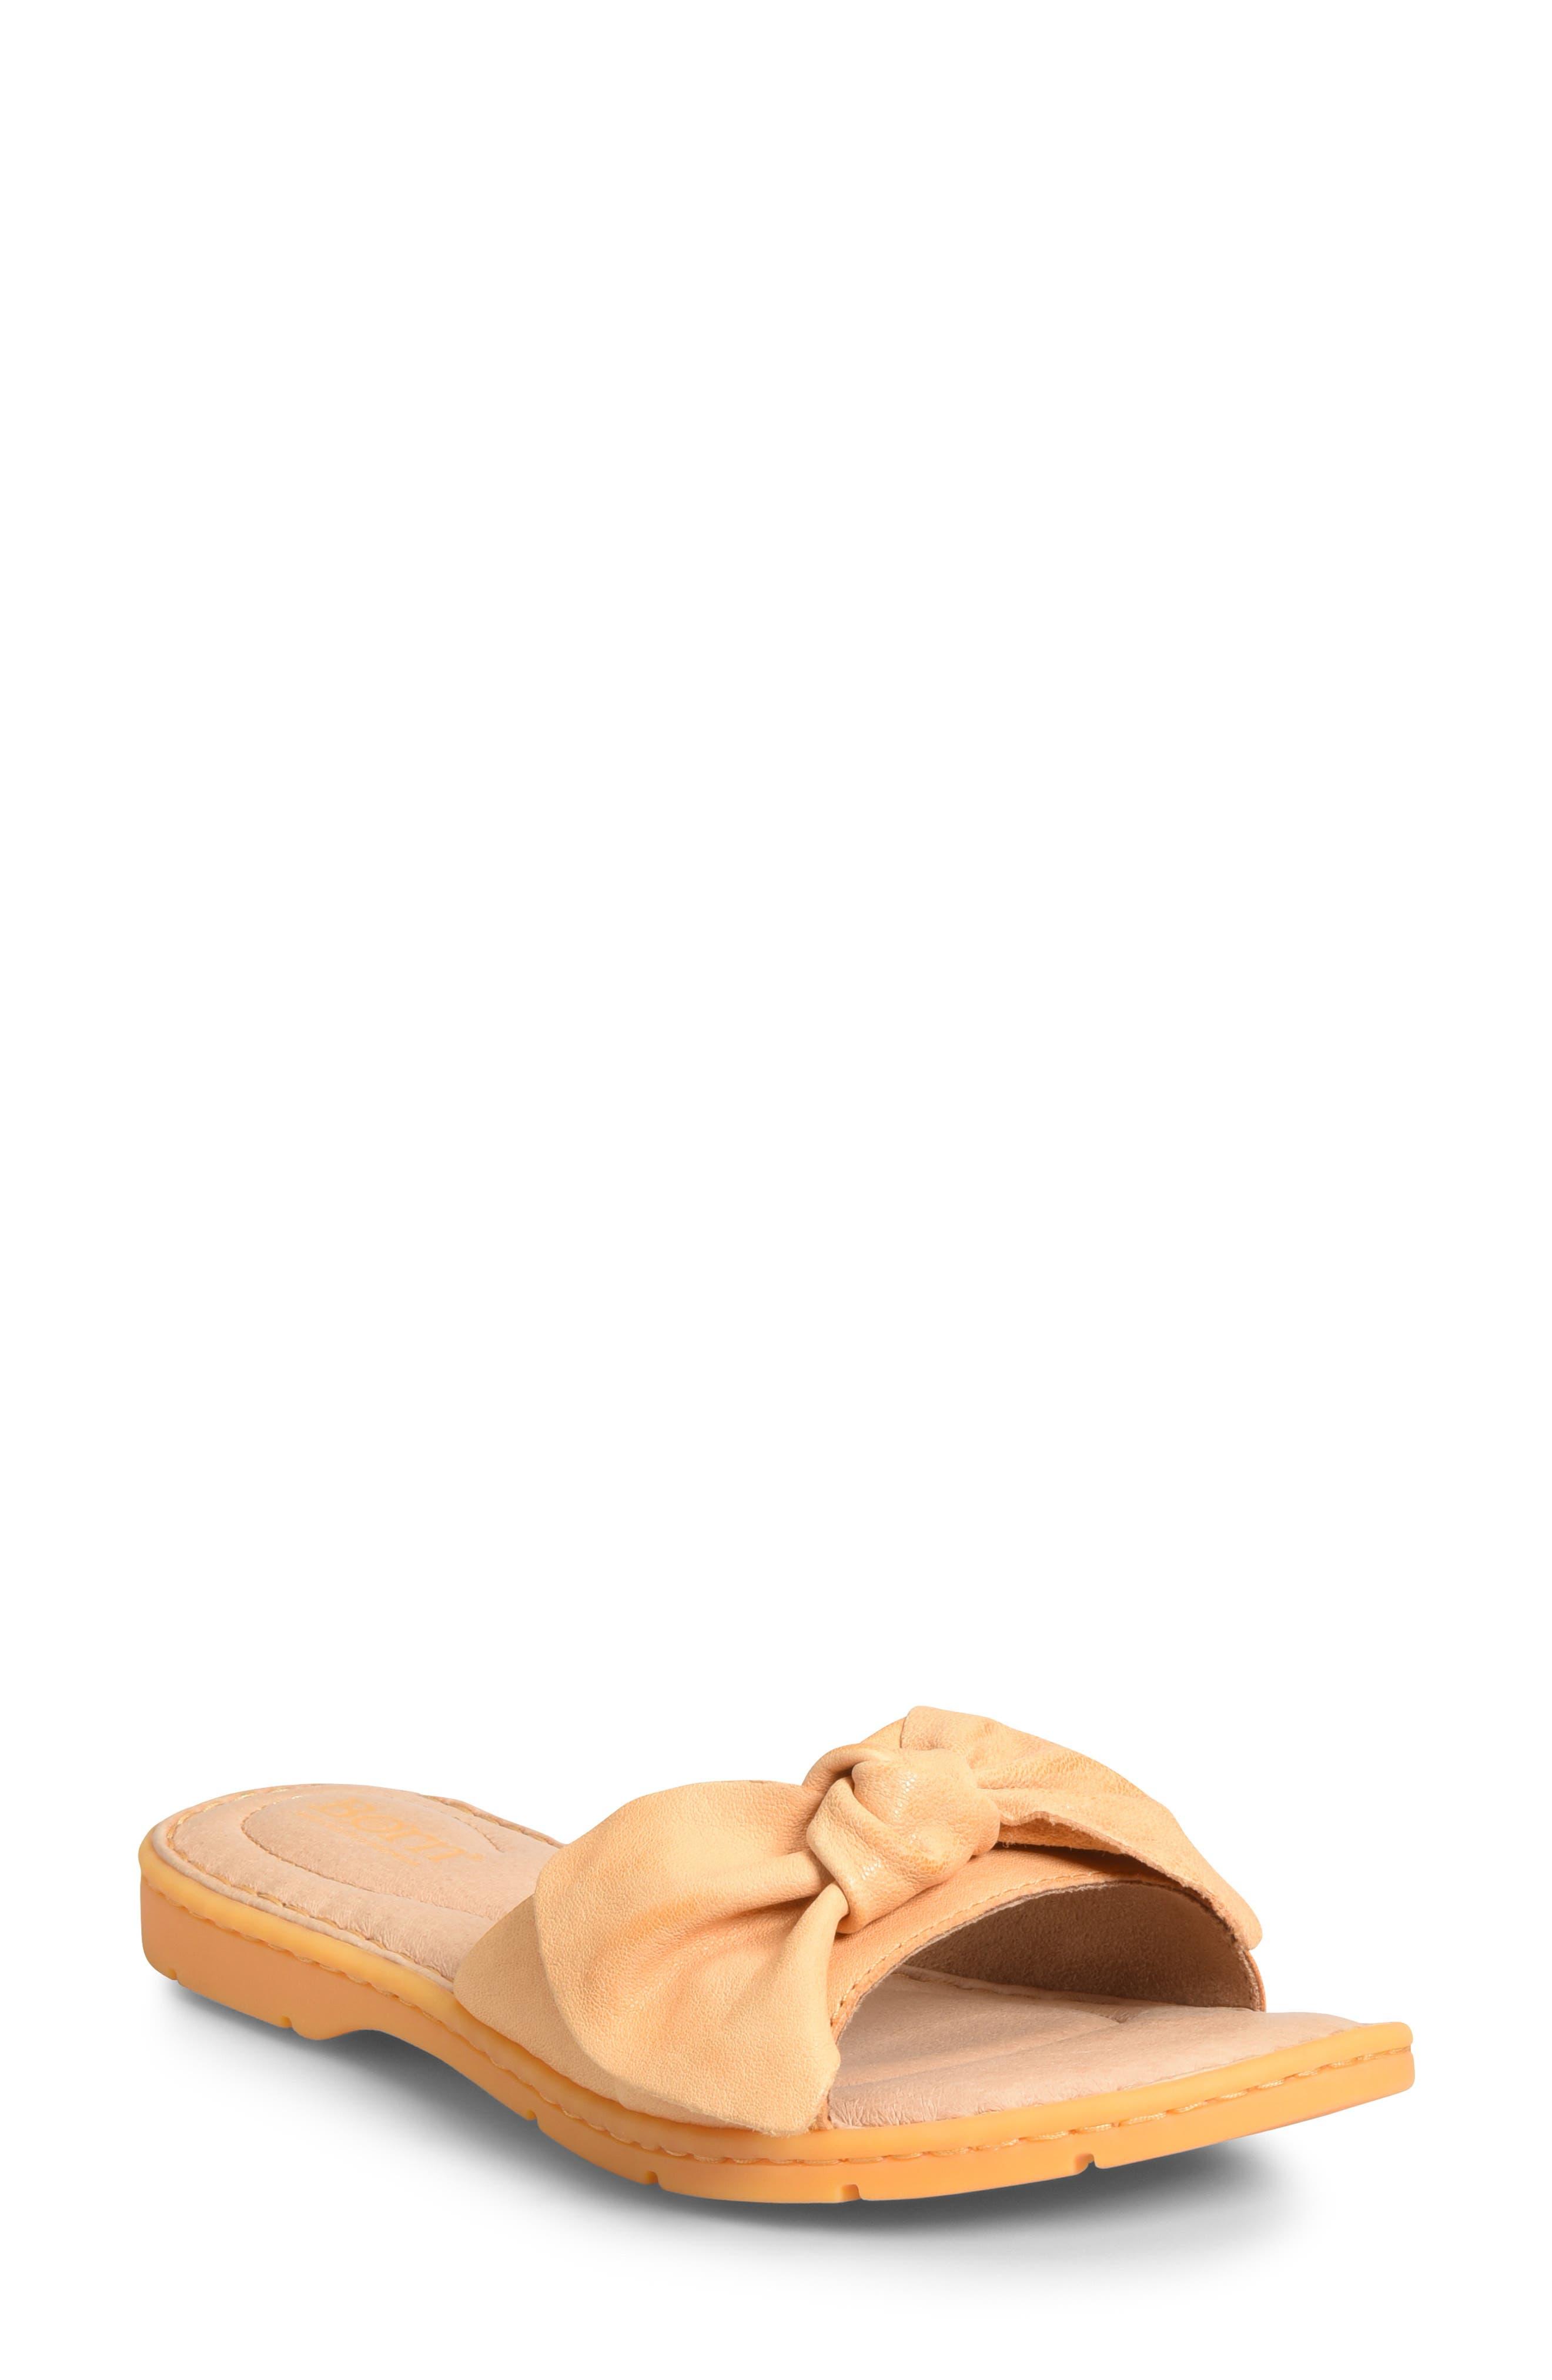 B?rn Teton Knotted Slide Sandal, Orange